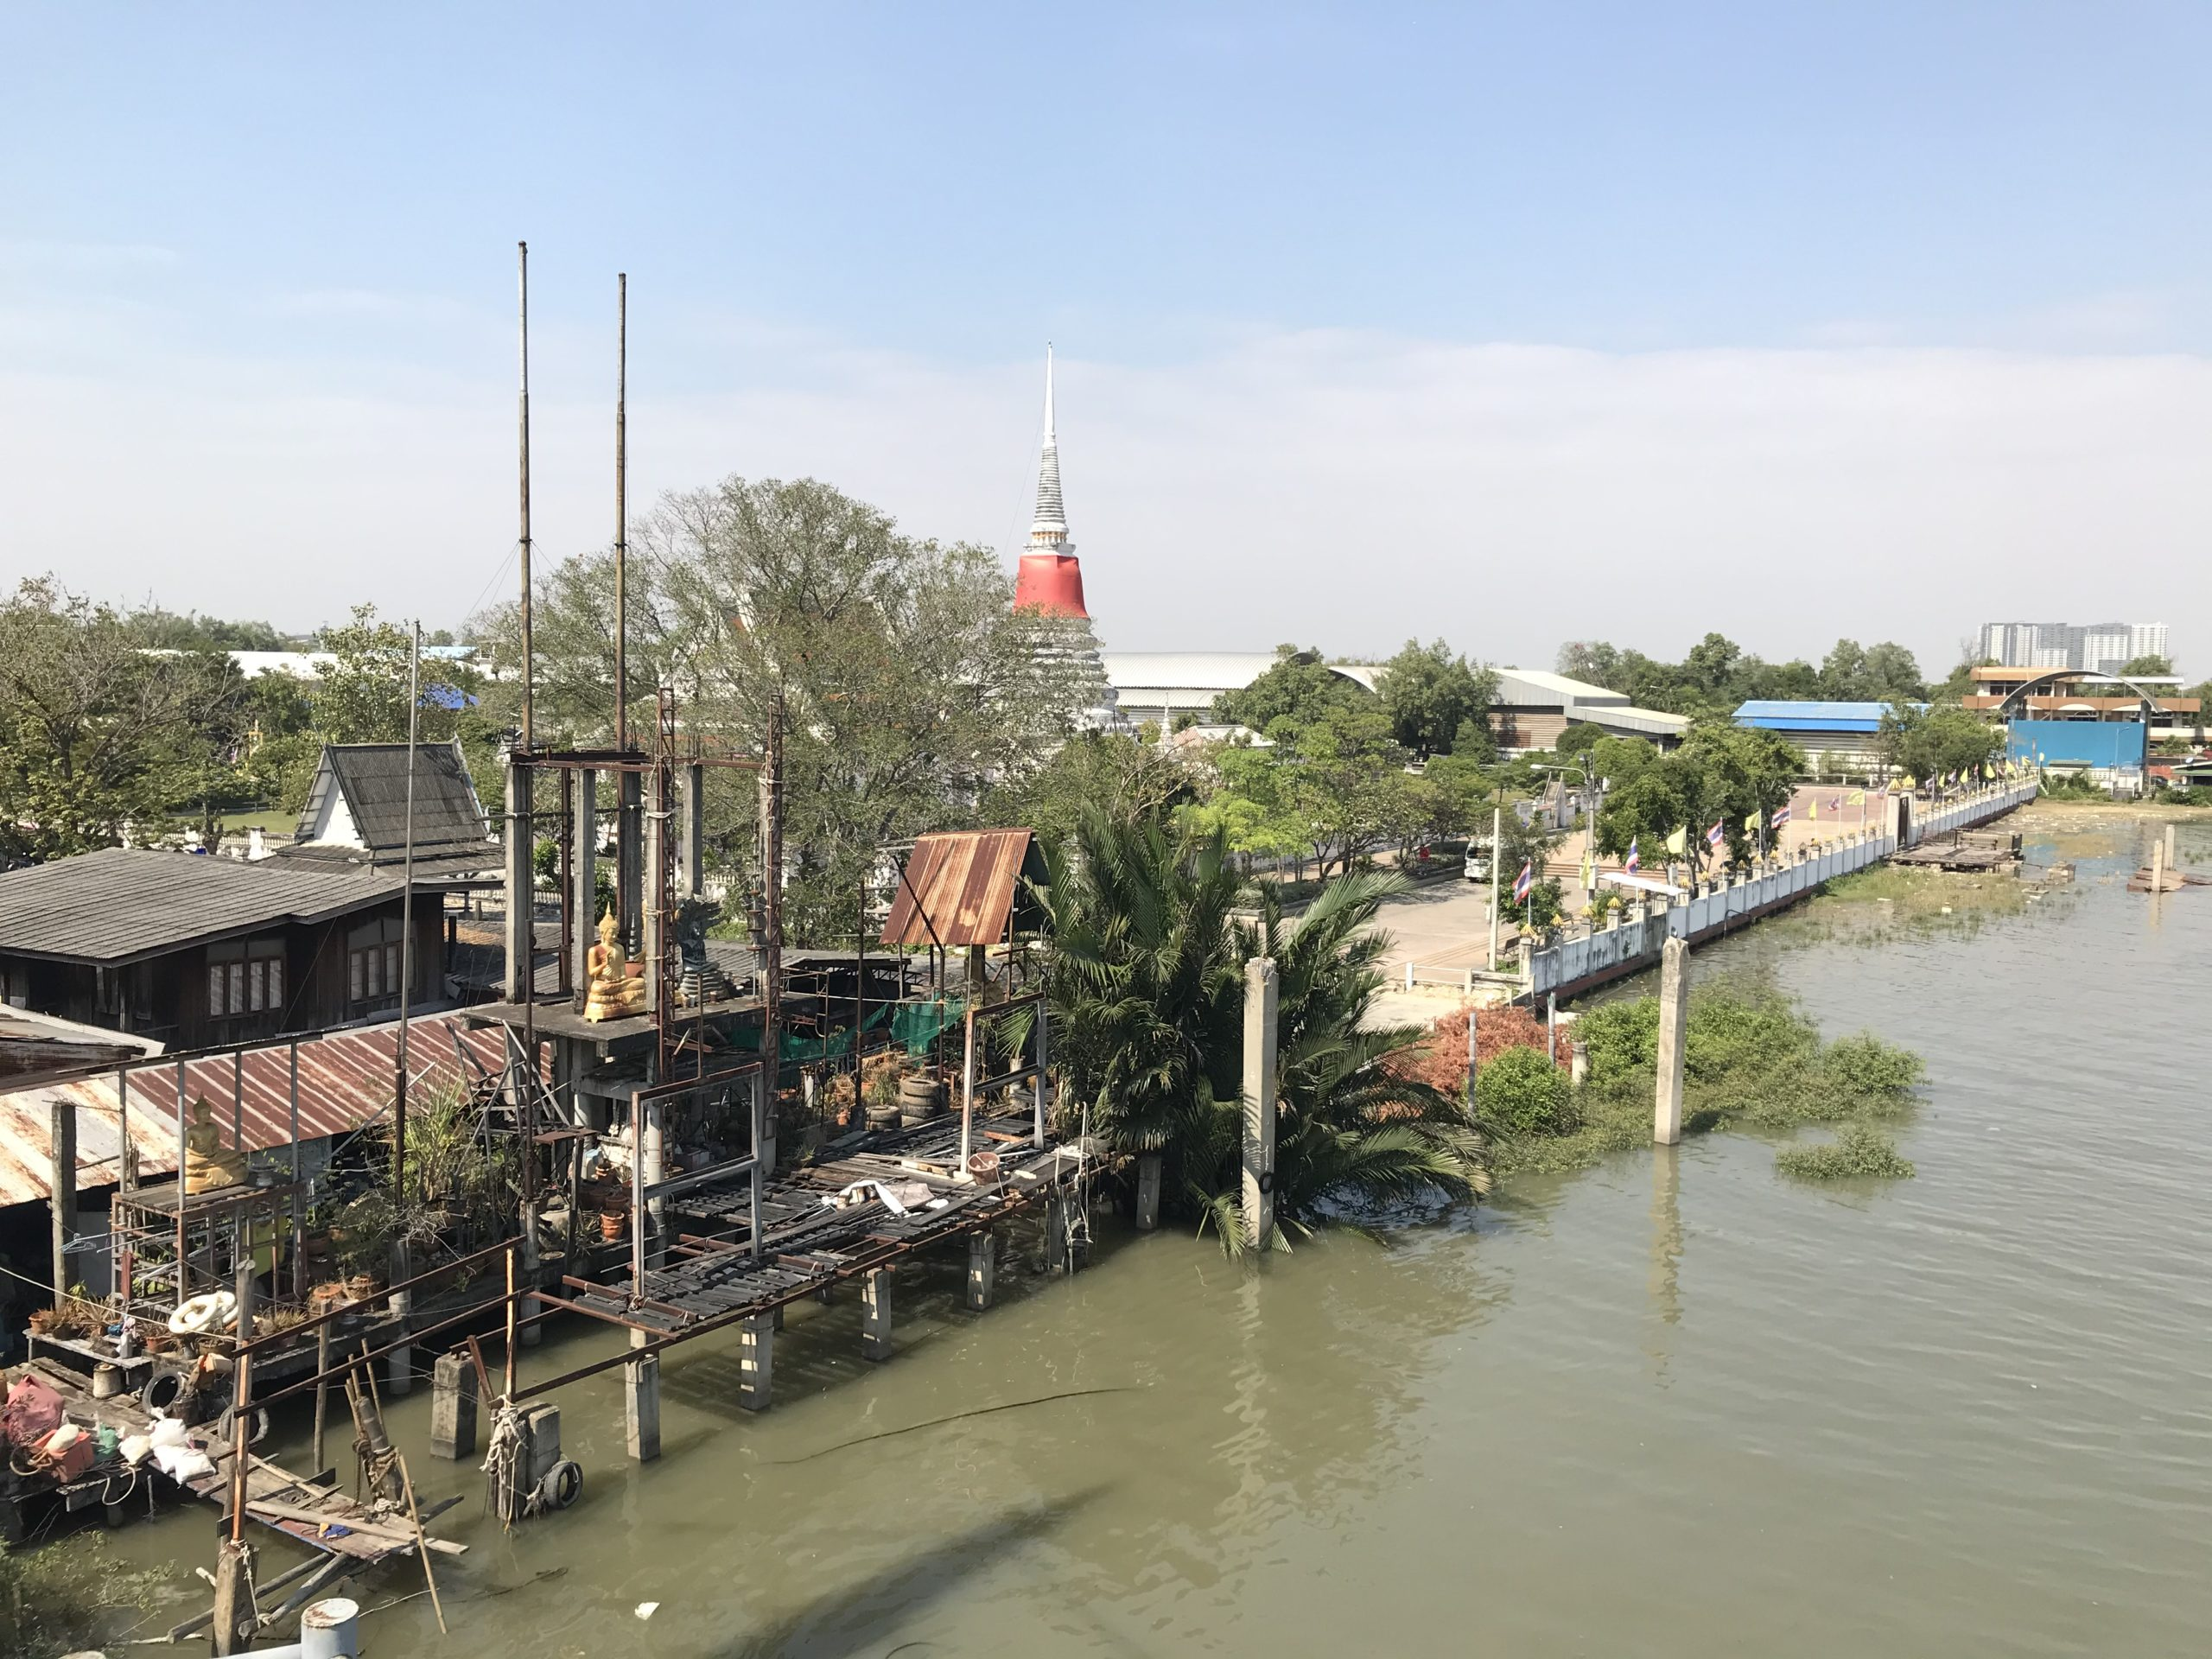 Phra samut chedi寺院〜ピースアサムット要塞